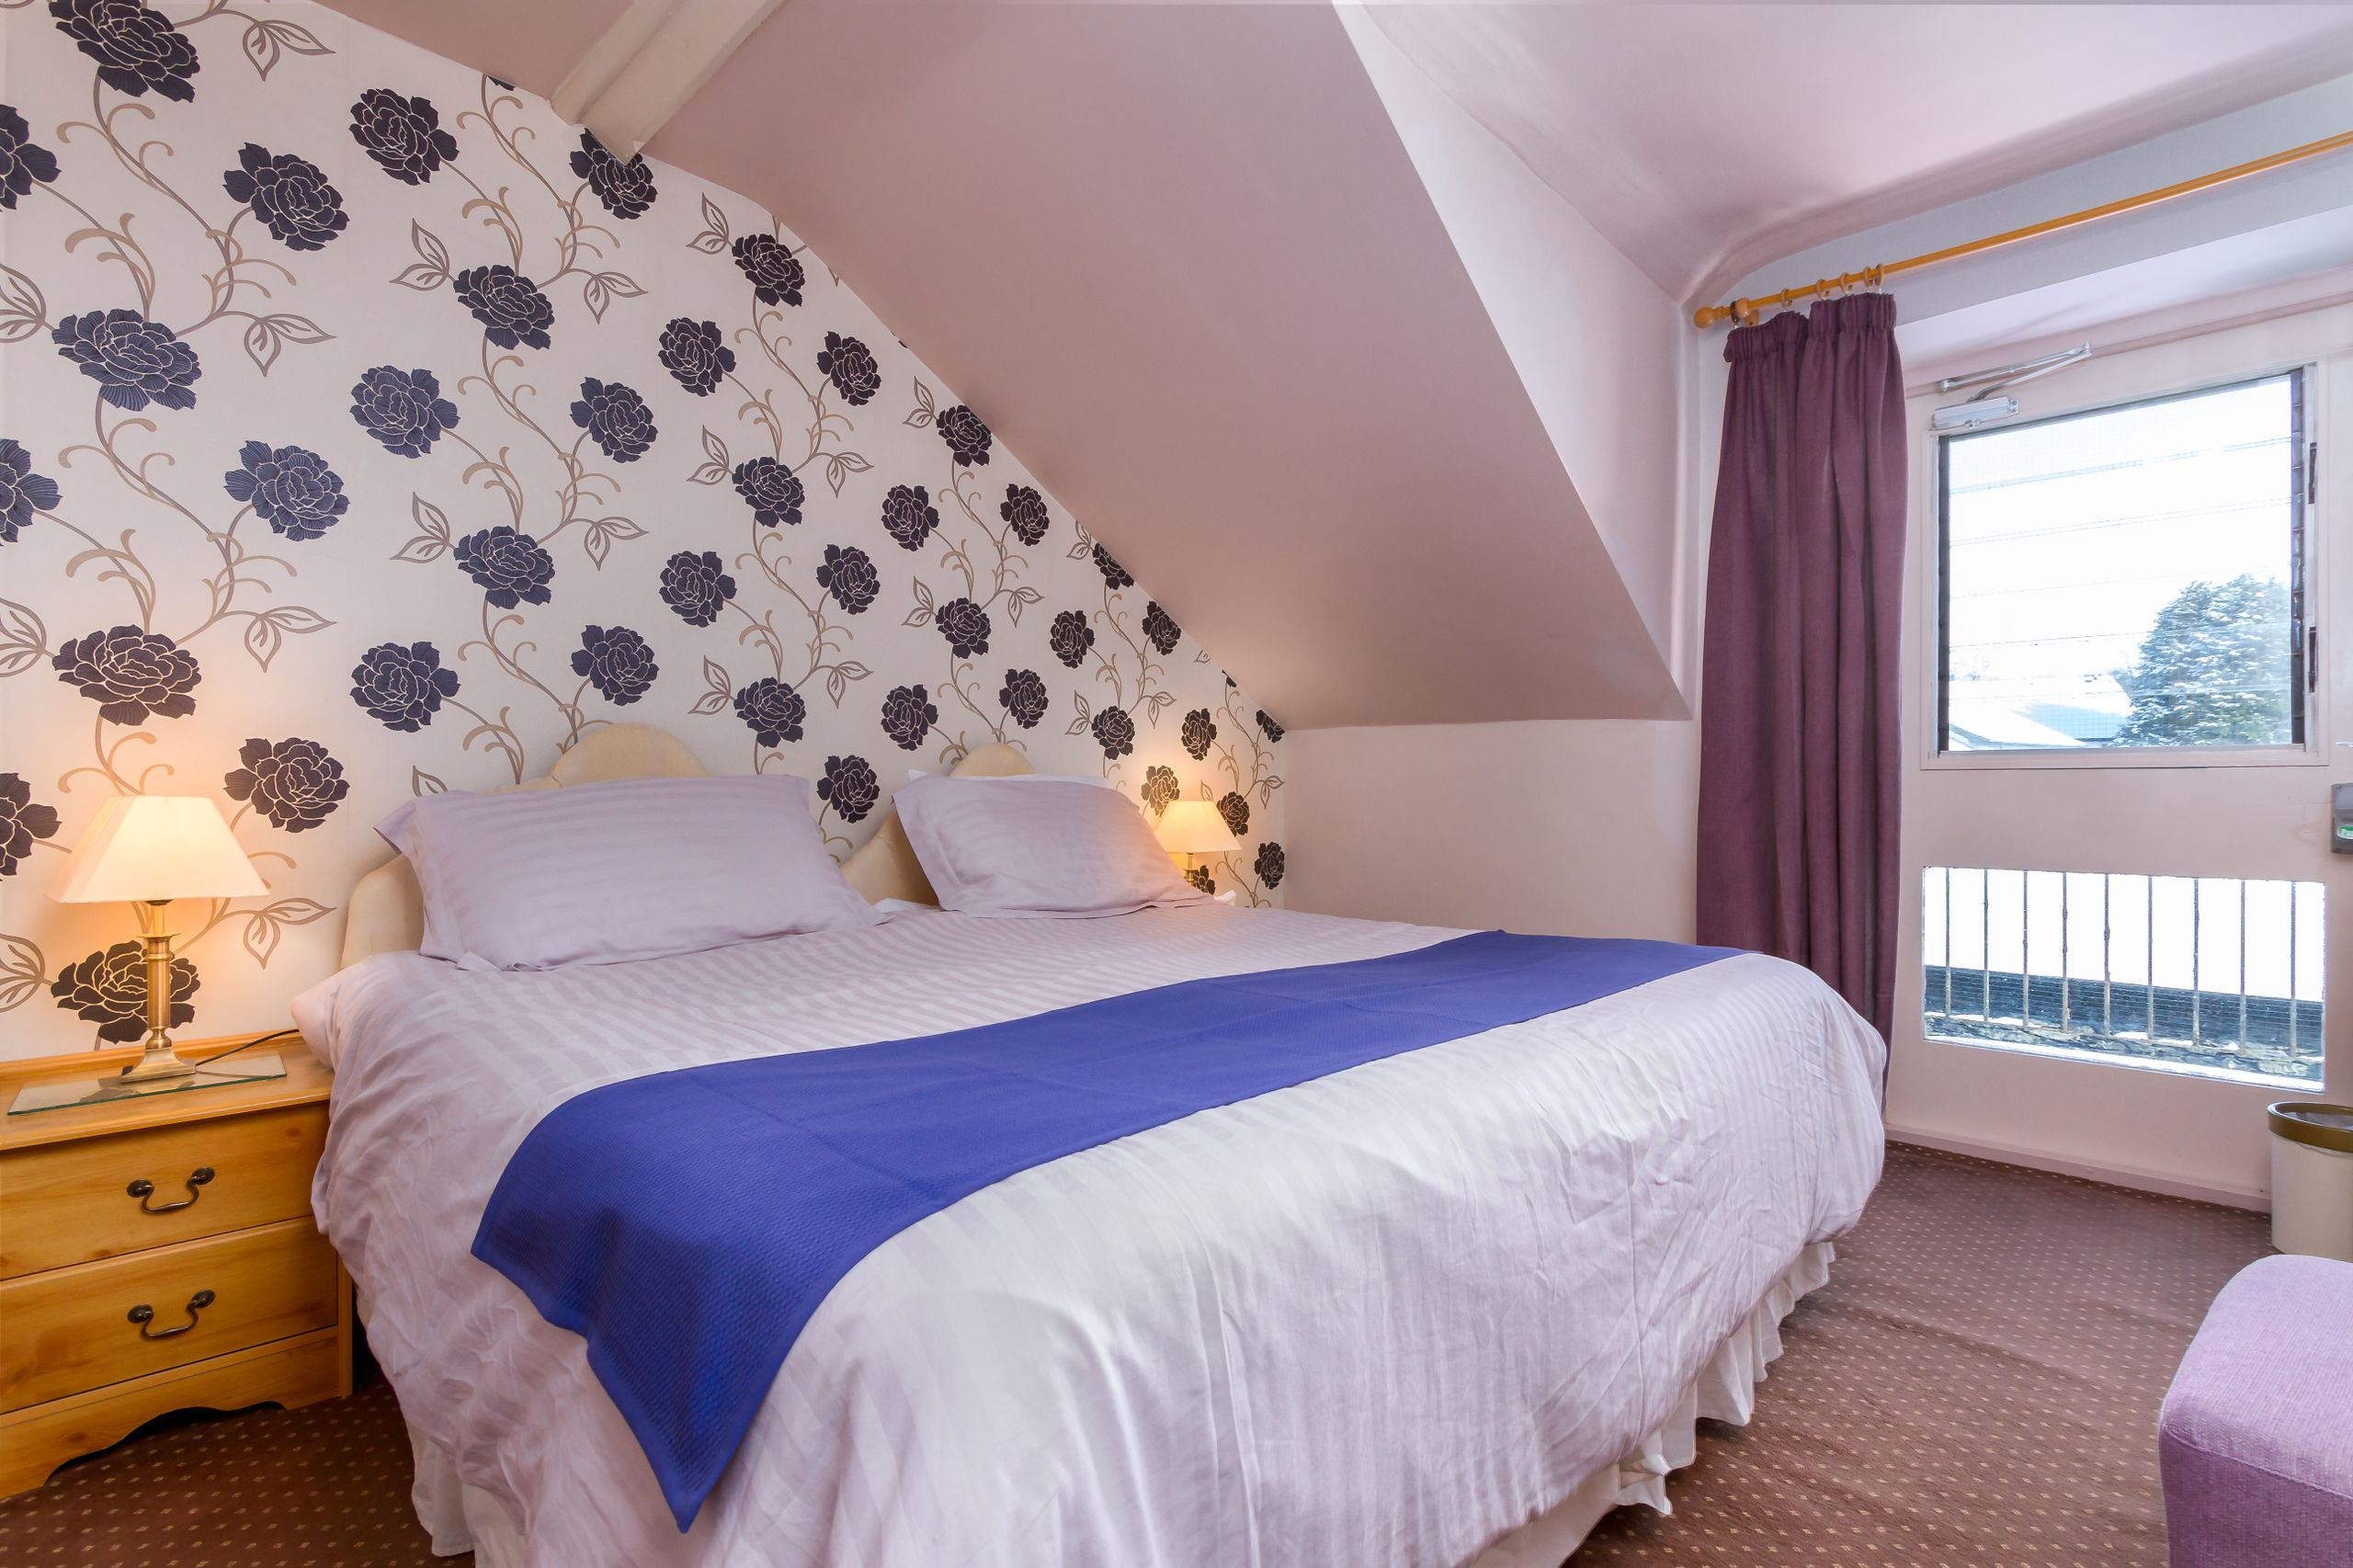 elim-guest-house-windermere-room-7-super-king-bedroom-with-en-suite-bathroom (4)